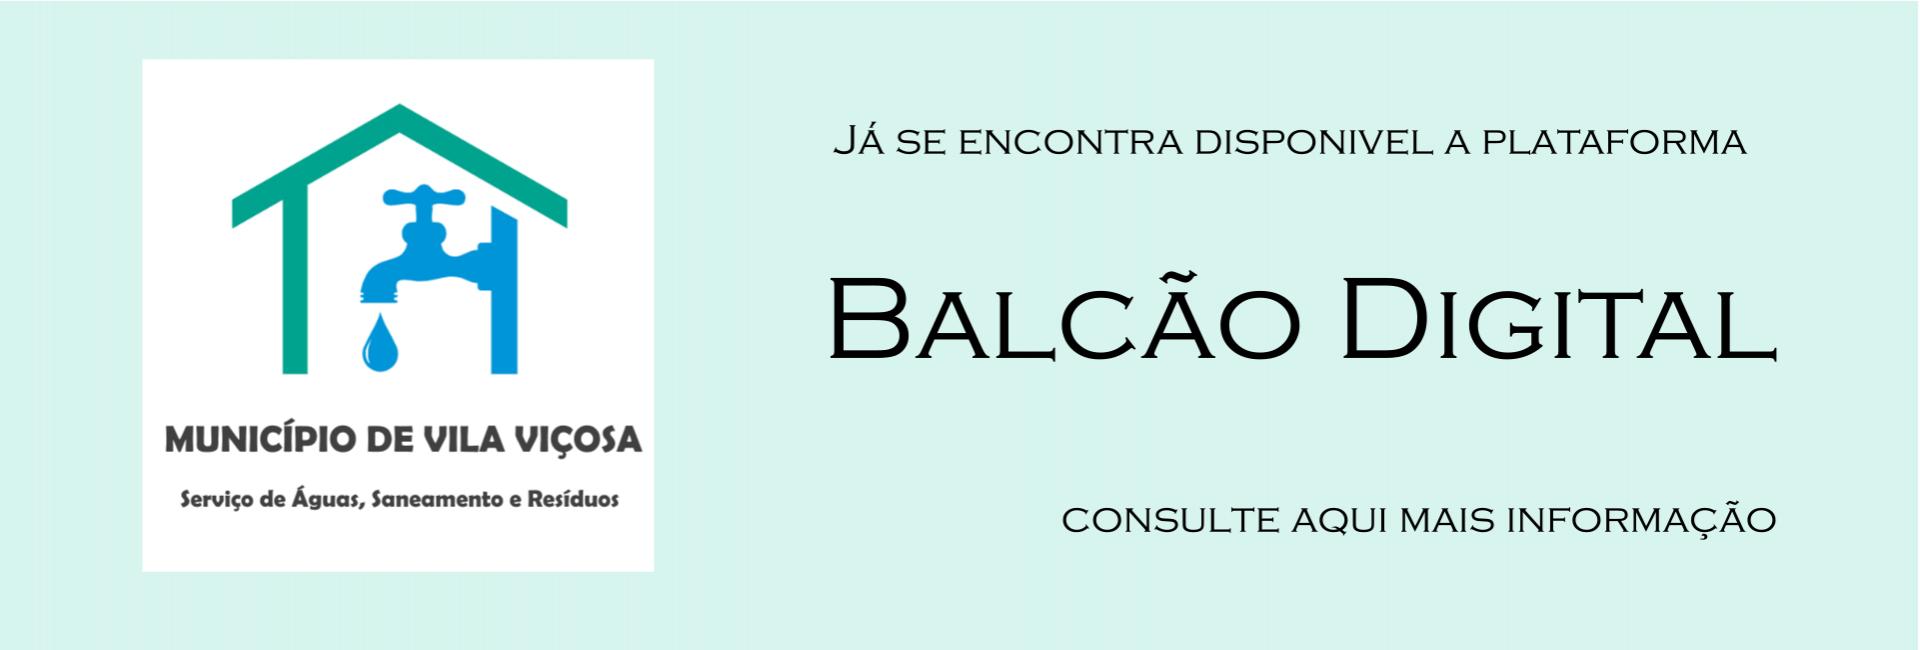 banner balcao digital_ok